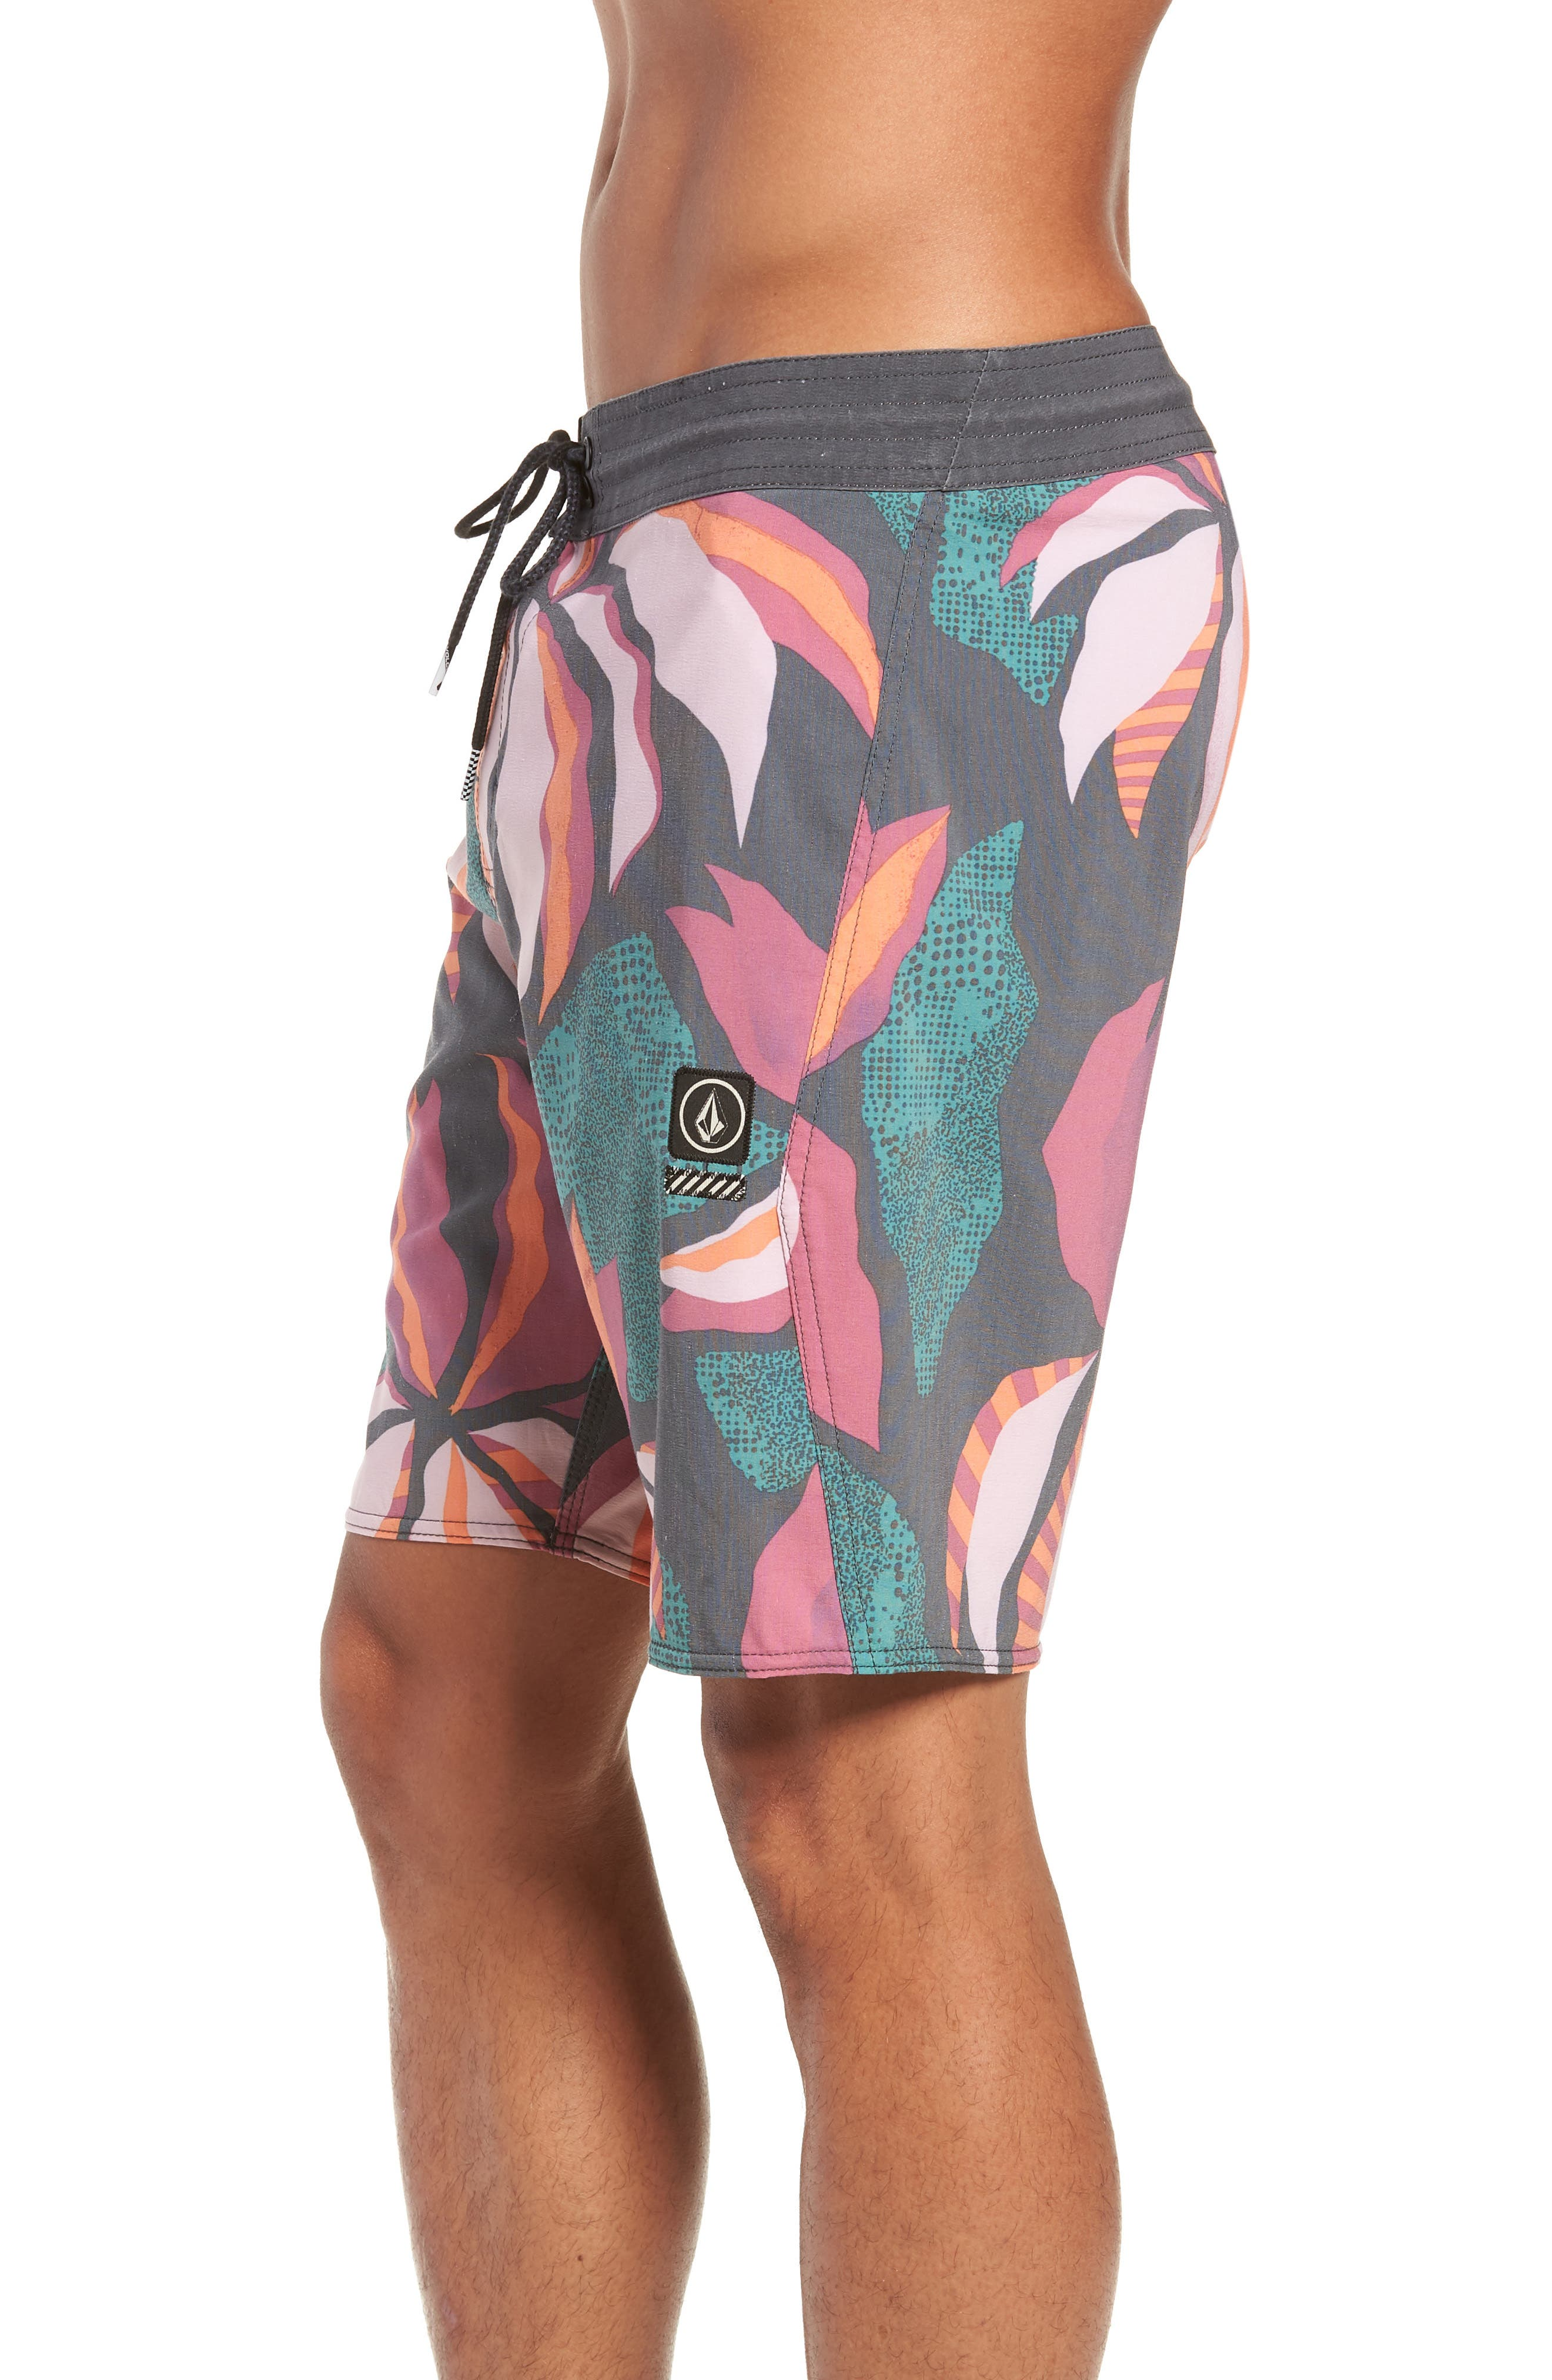 Garden Stoney Board Shorts,                             Alternate thumbnail 3, color,                             ASPHALT BLACK